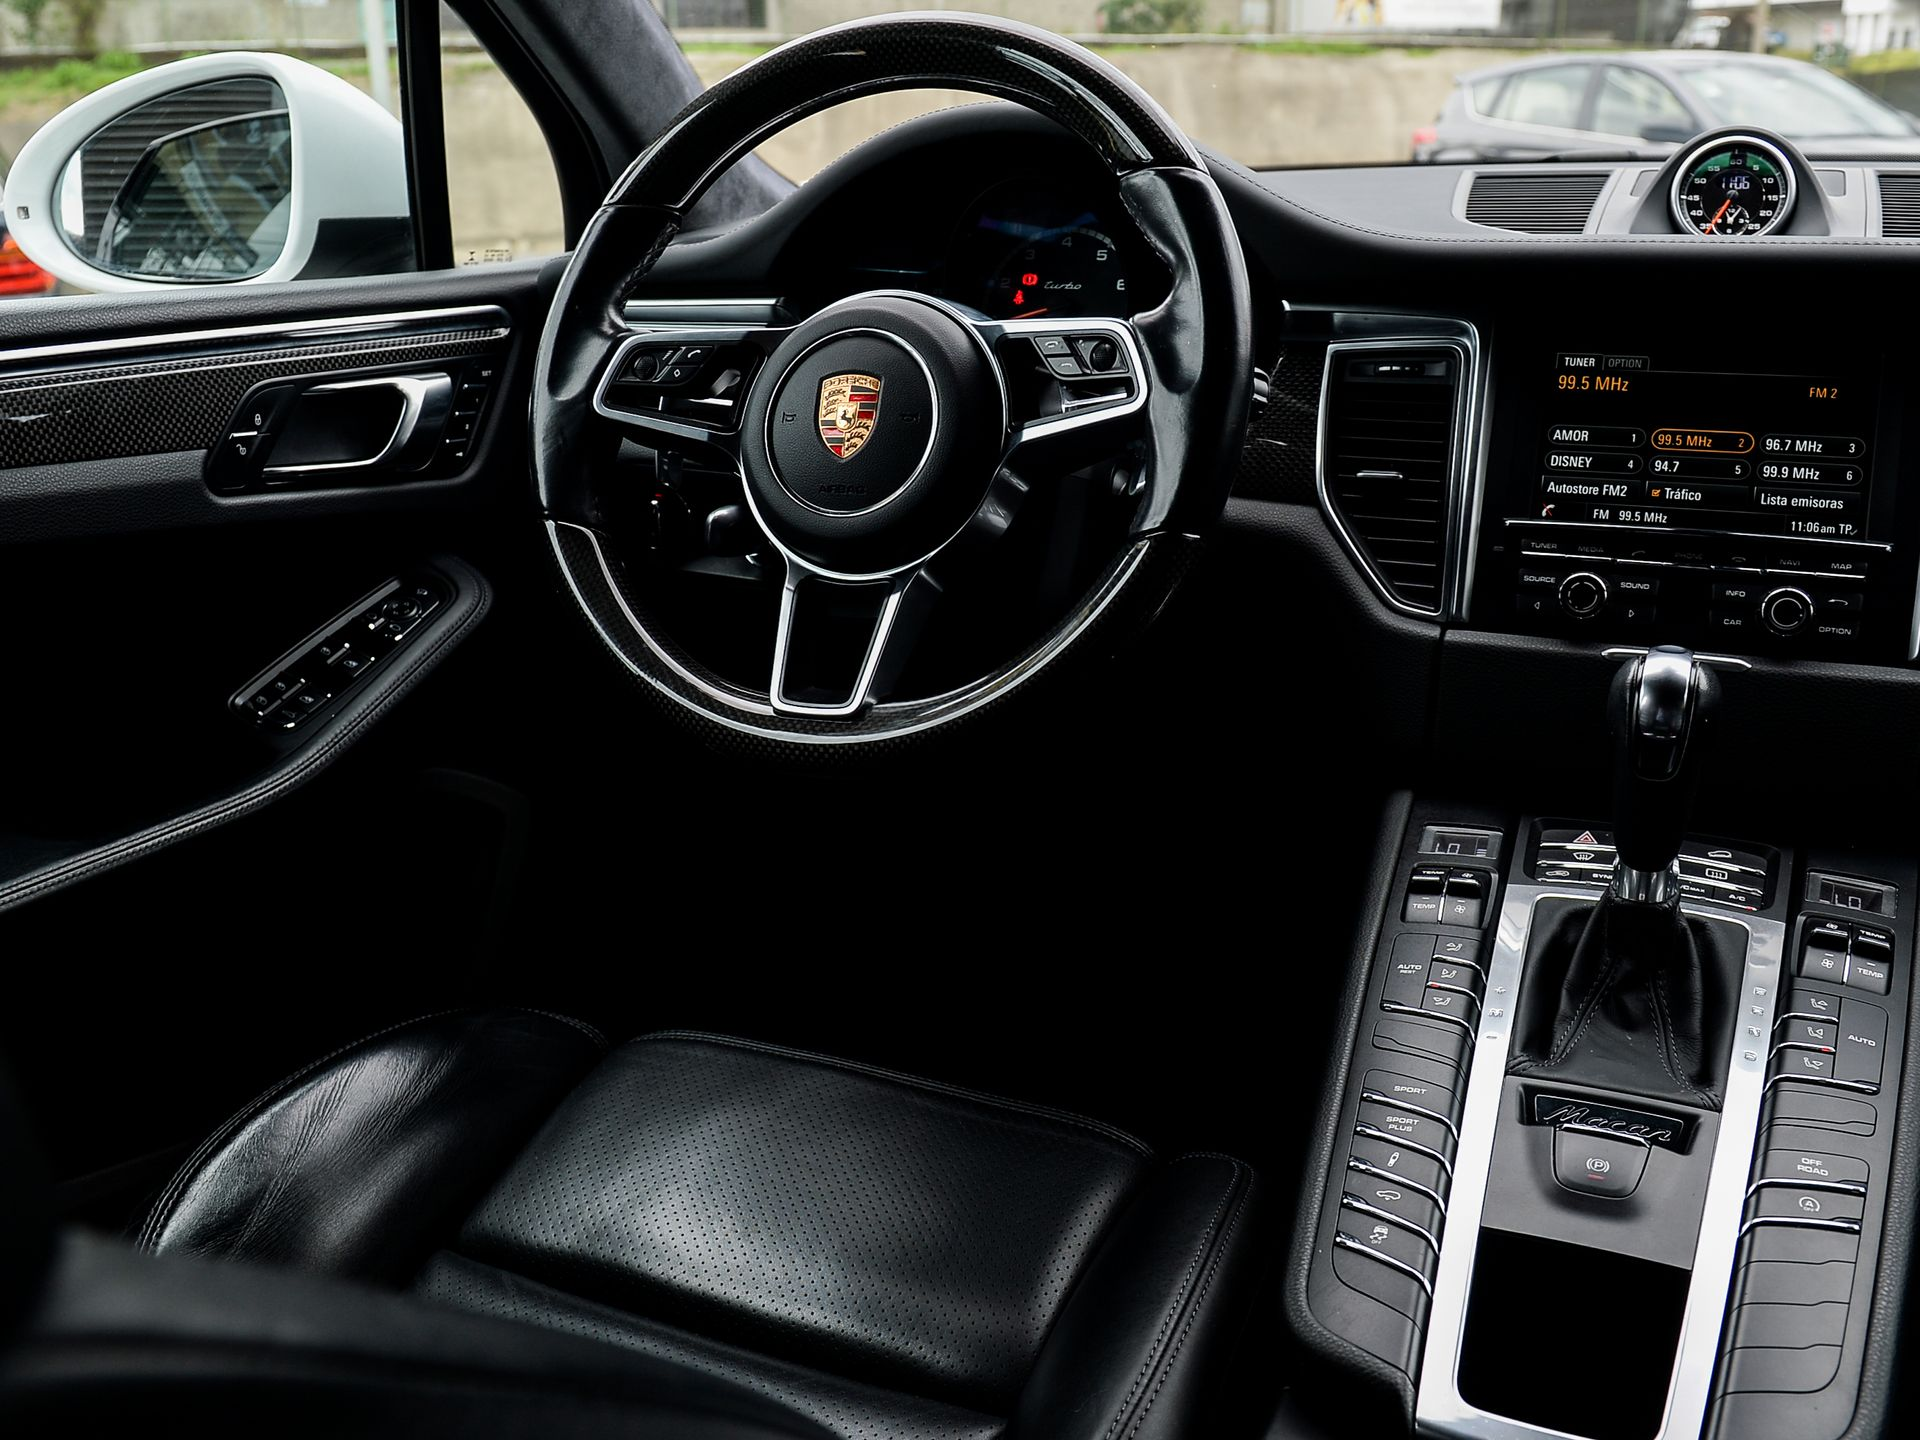 2015 Porsche Macan Turbo – 5